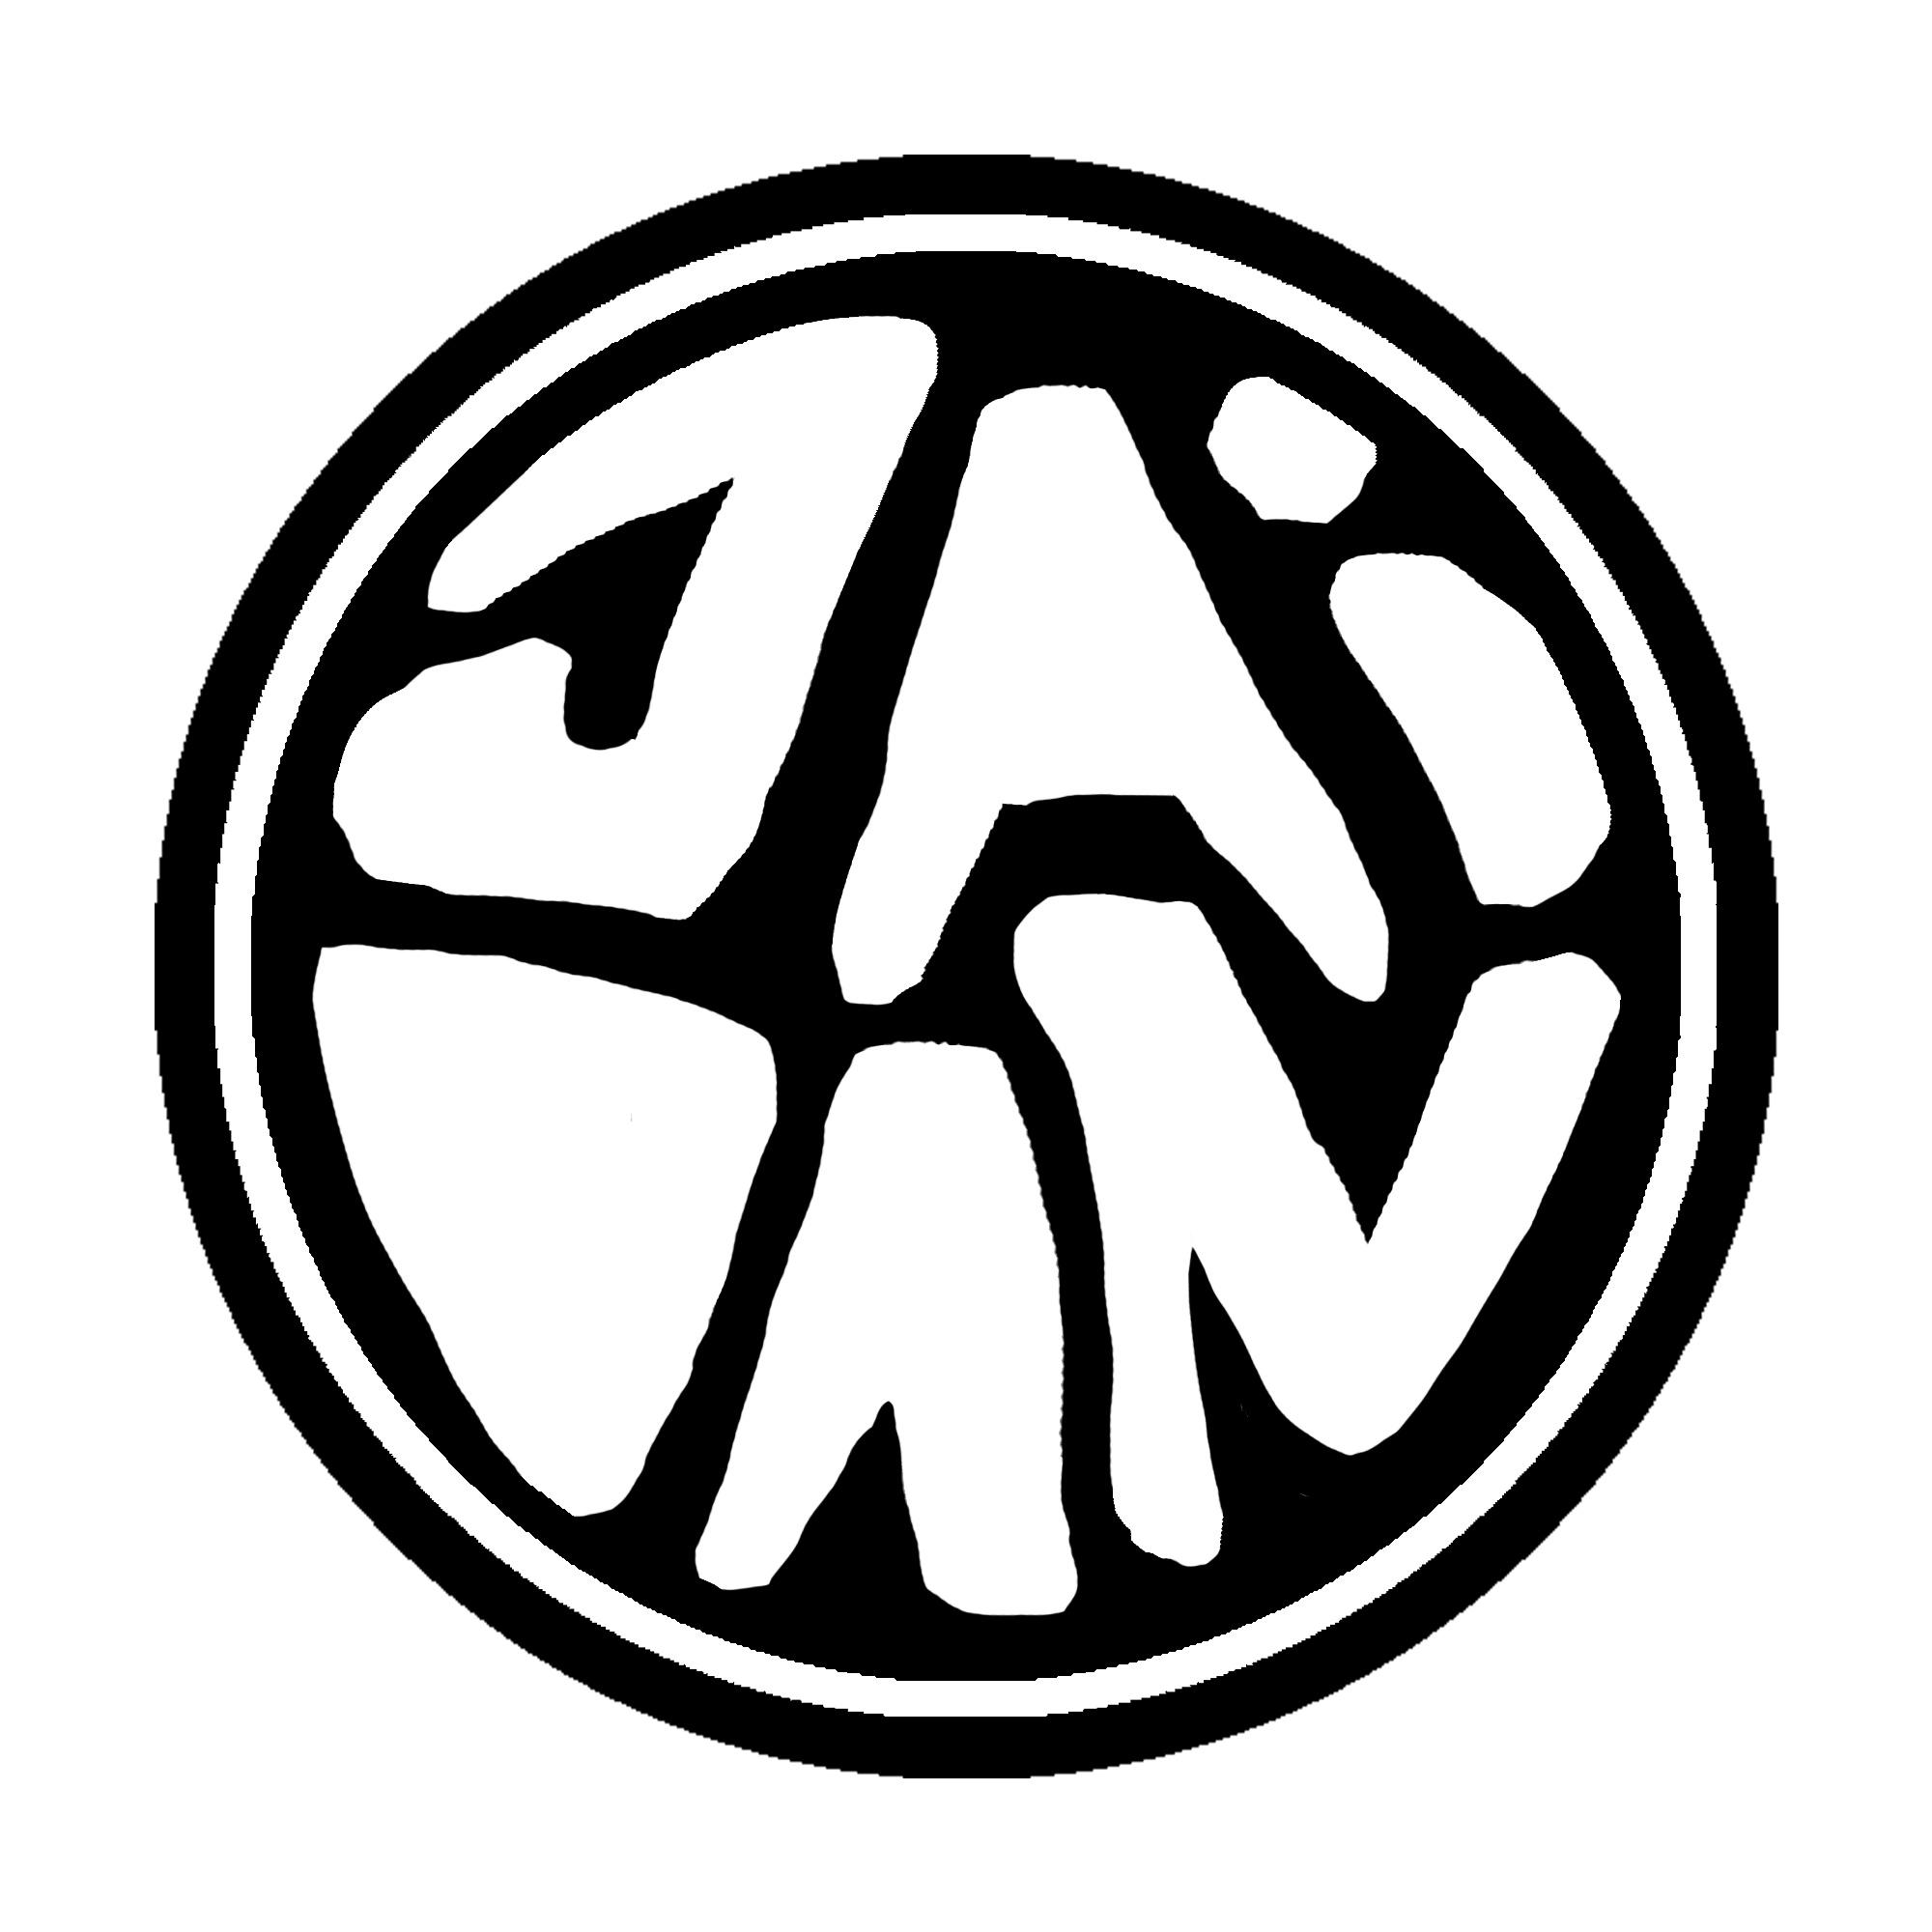 Wonderful Wallpaper Minecraft Steampunk - jaidan-logo-black  Trends_685216.jpeg